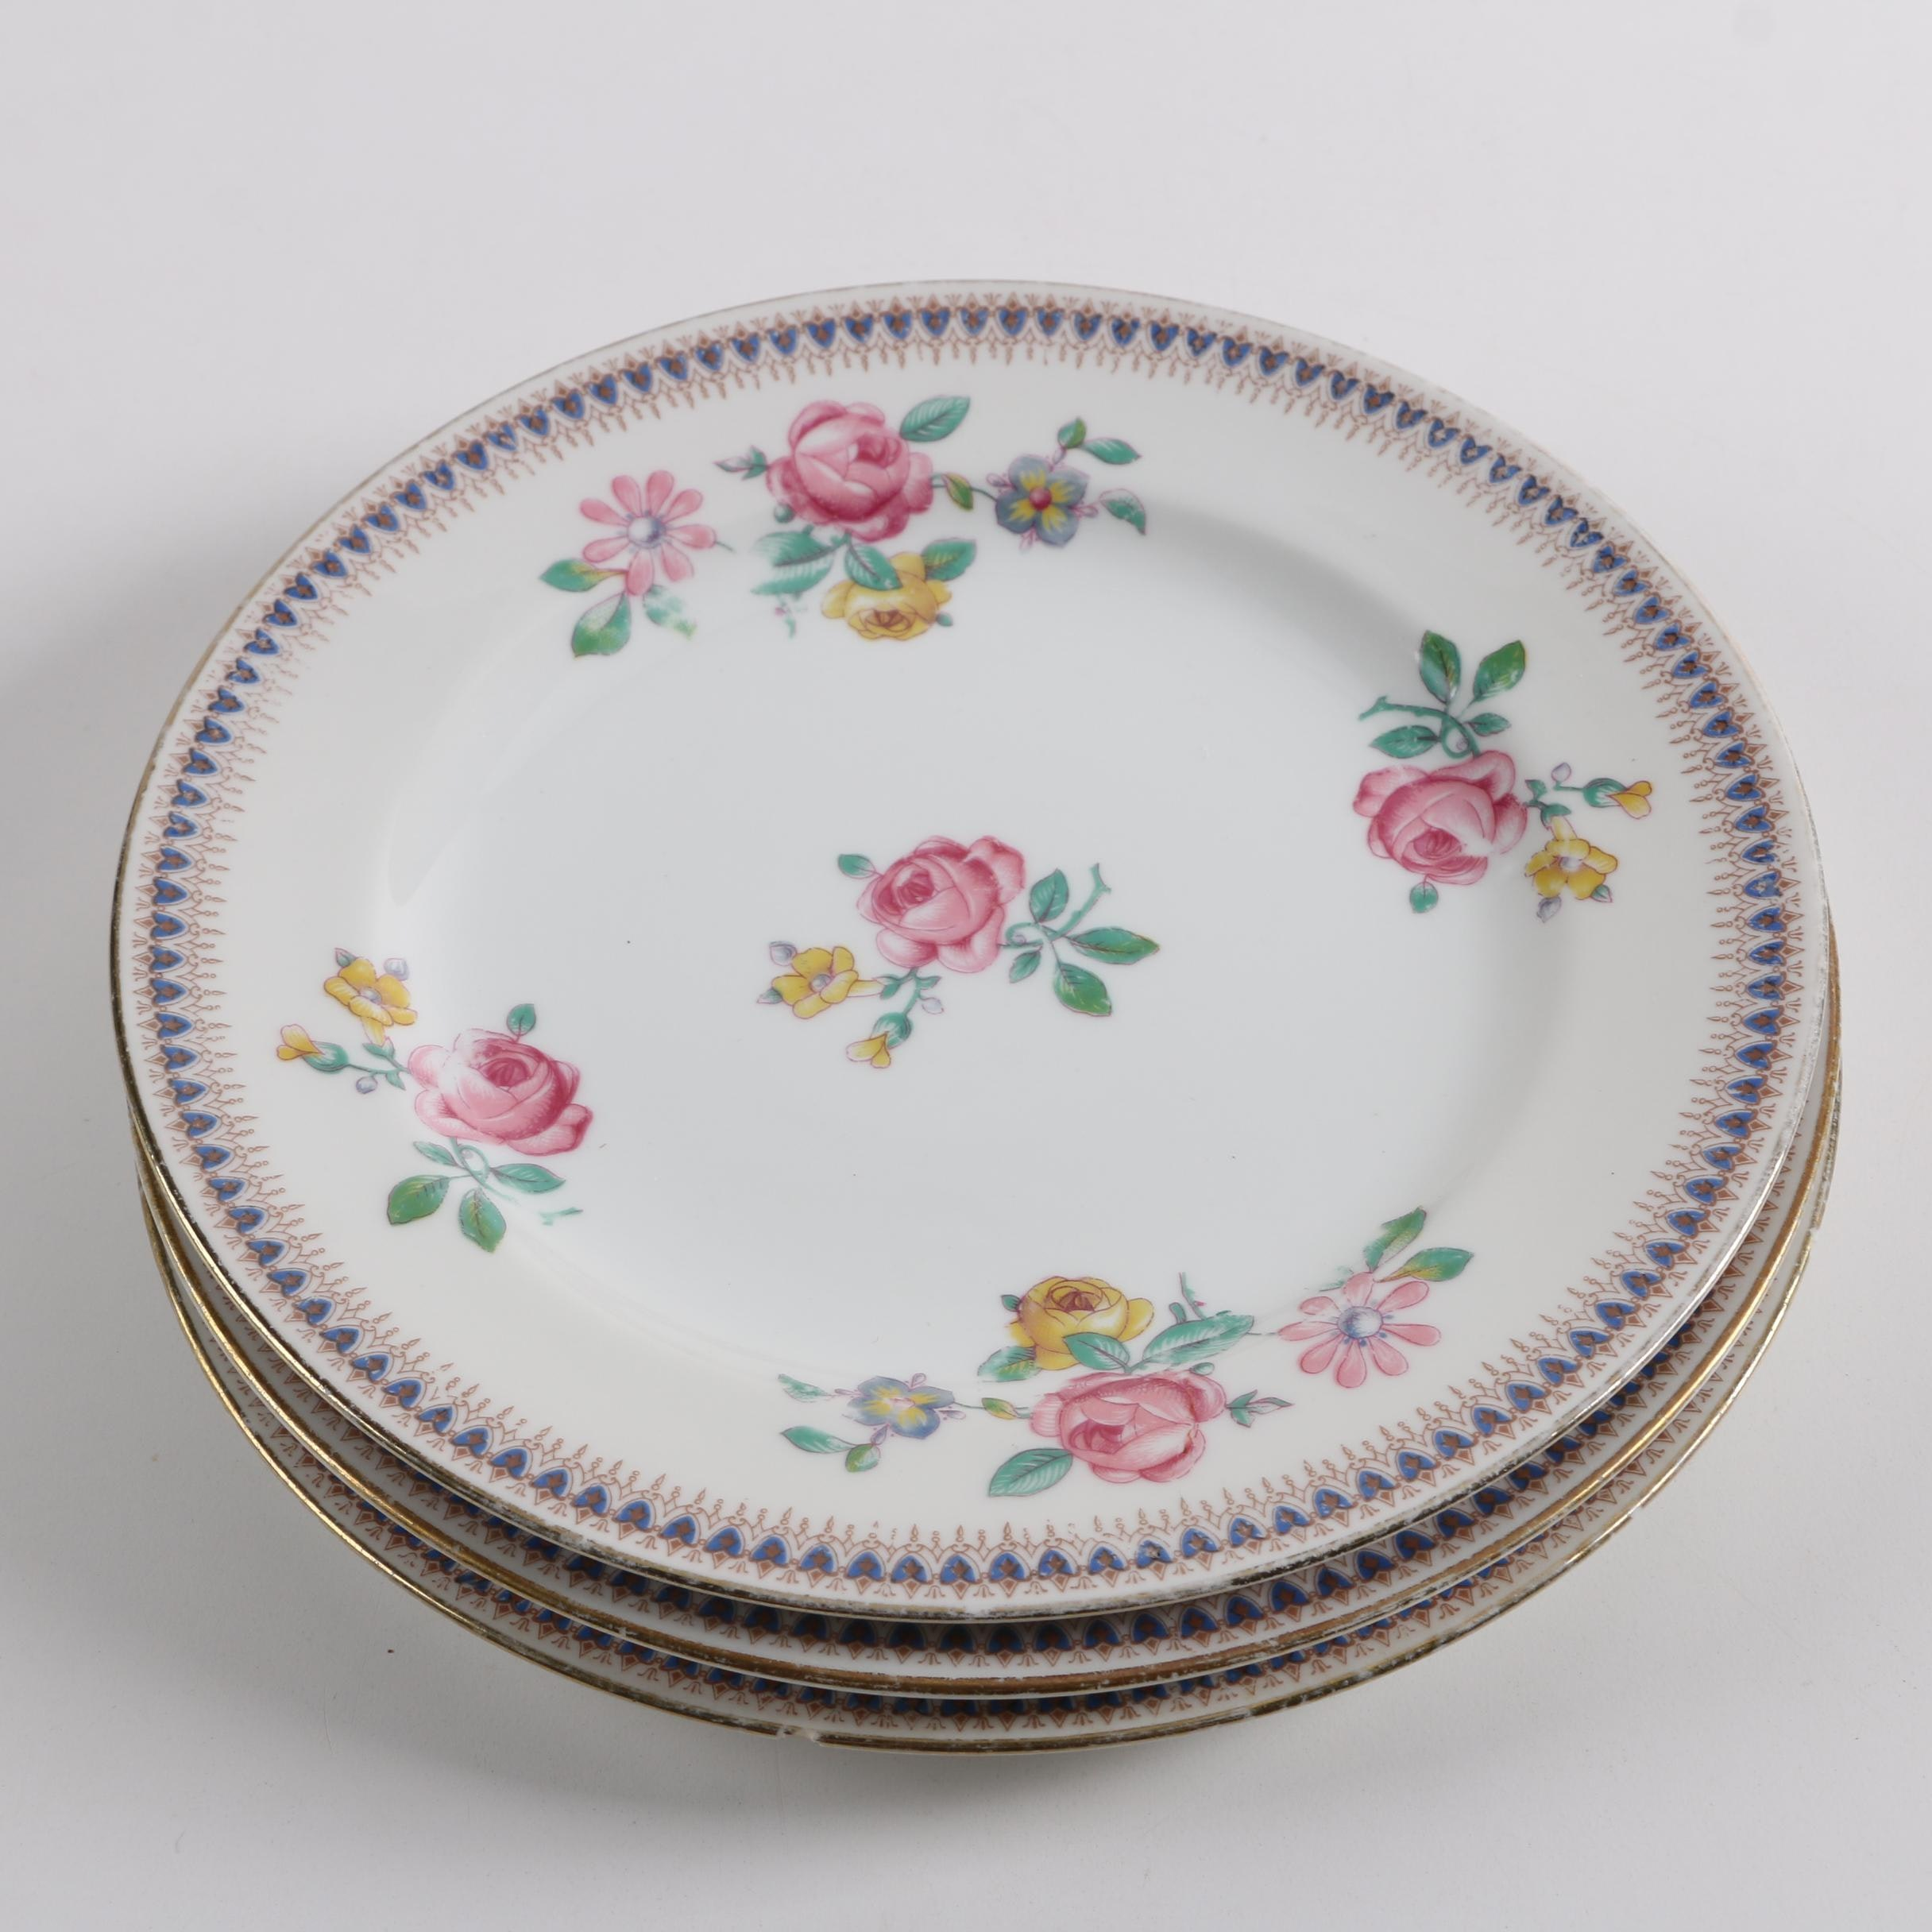 Vintage C. Ahrenfeldt Limoges Porcelain Plates